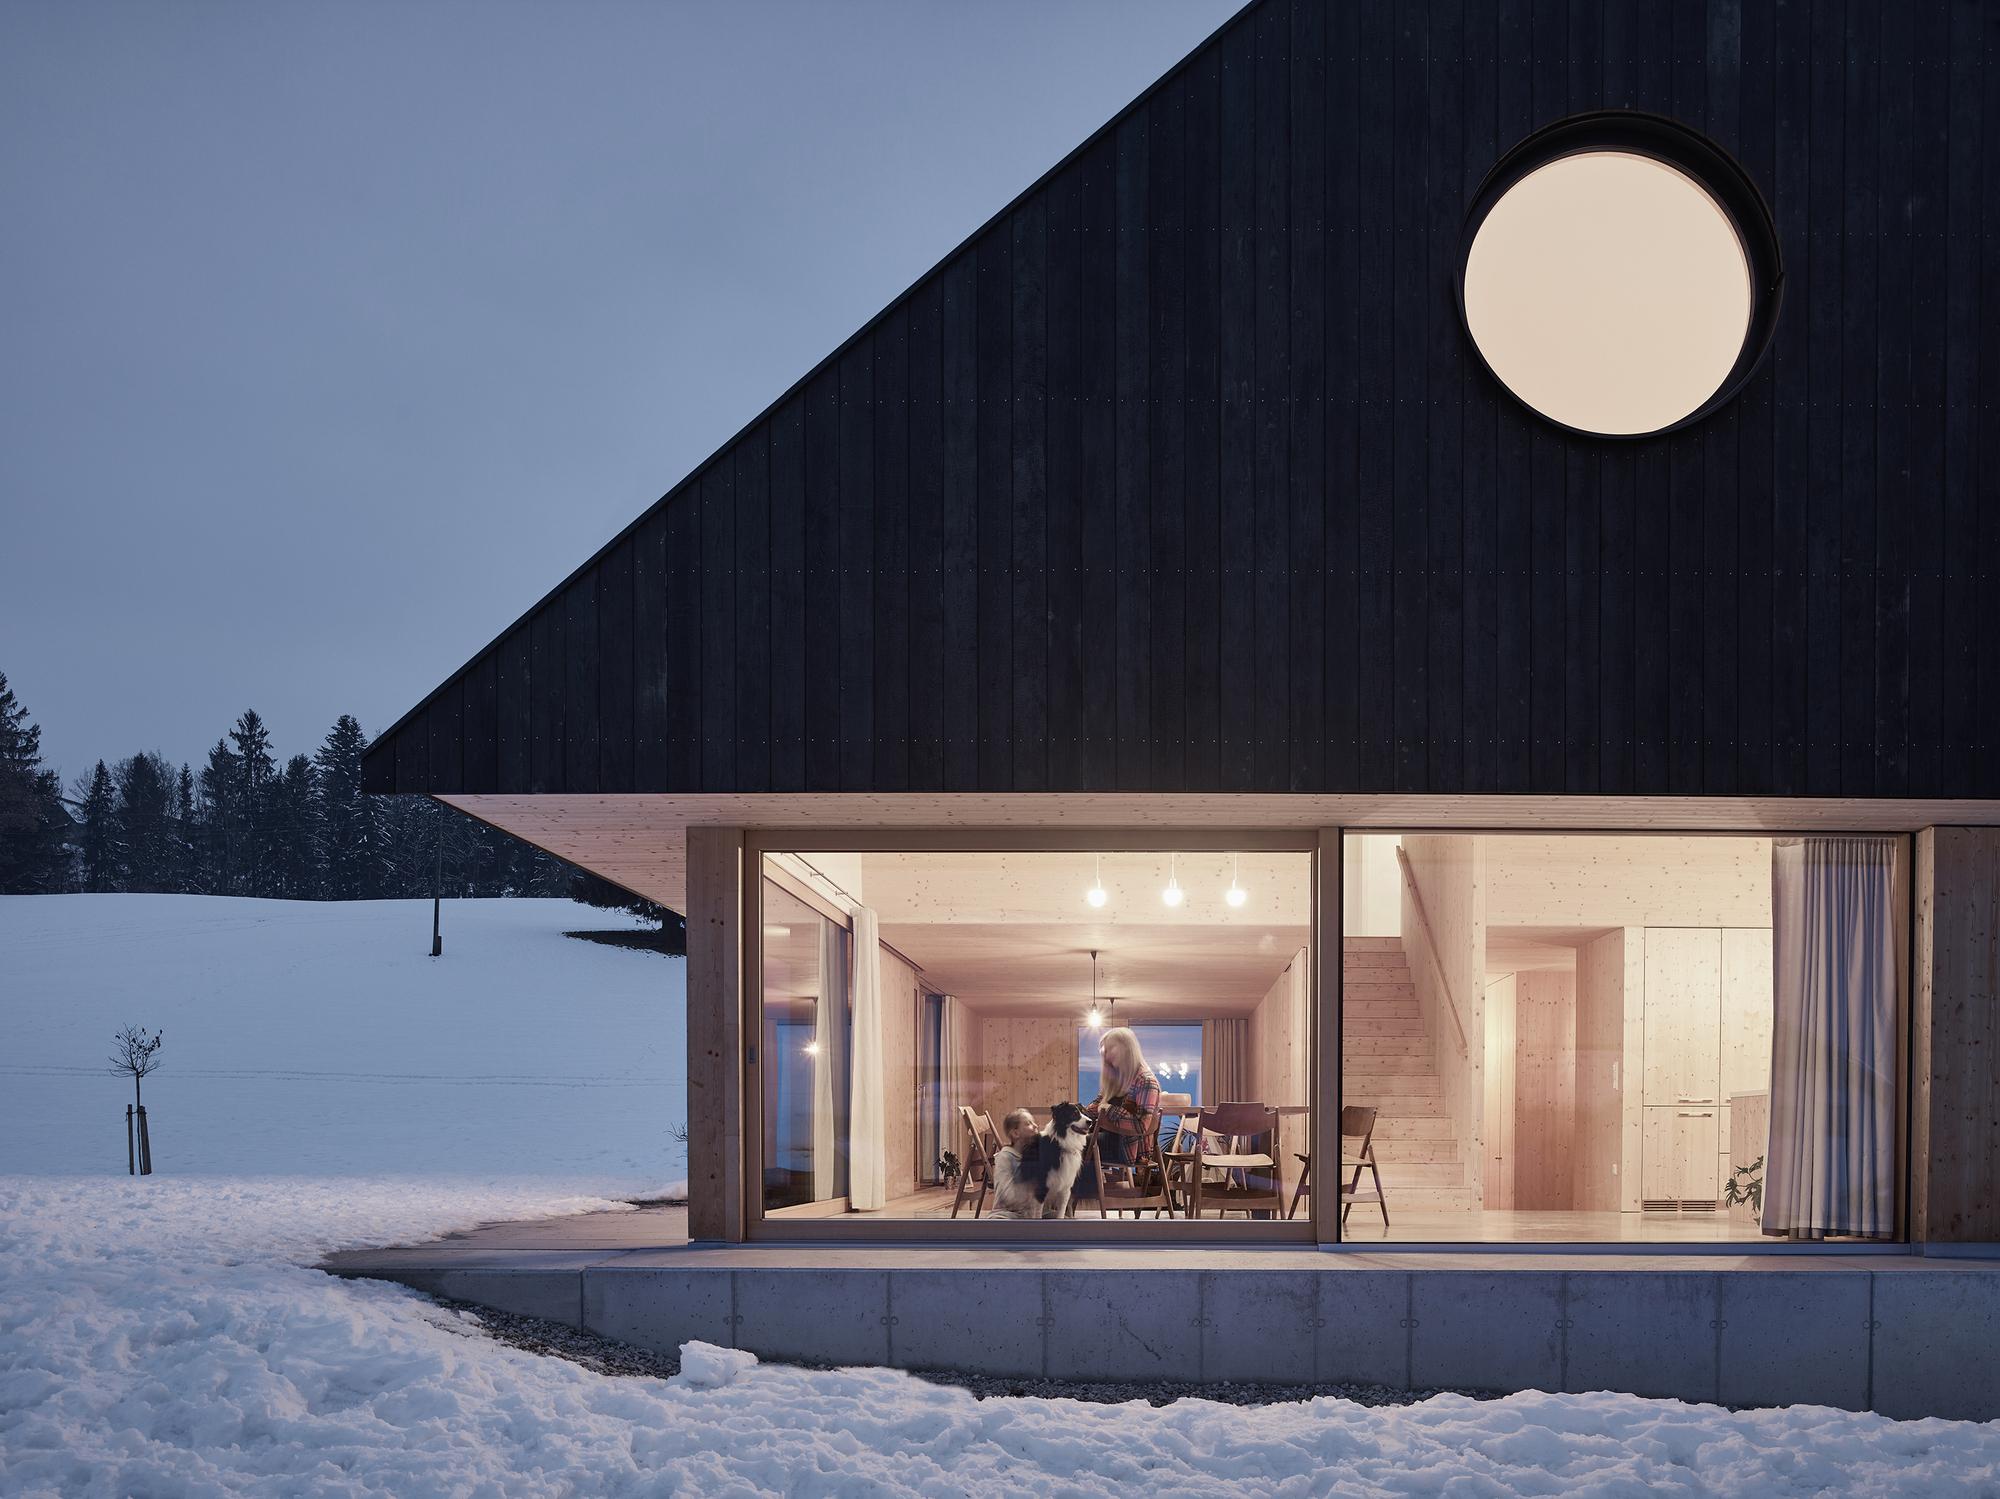 Minimalist Modern The Architecture Of